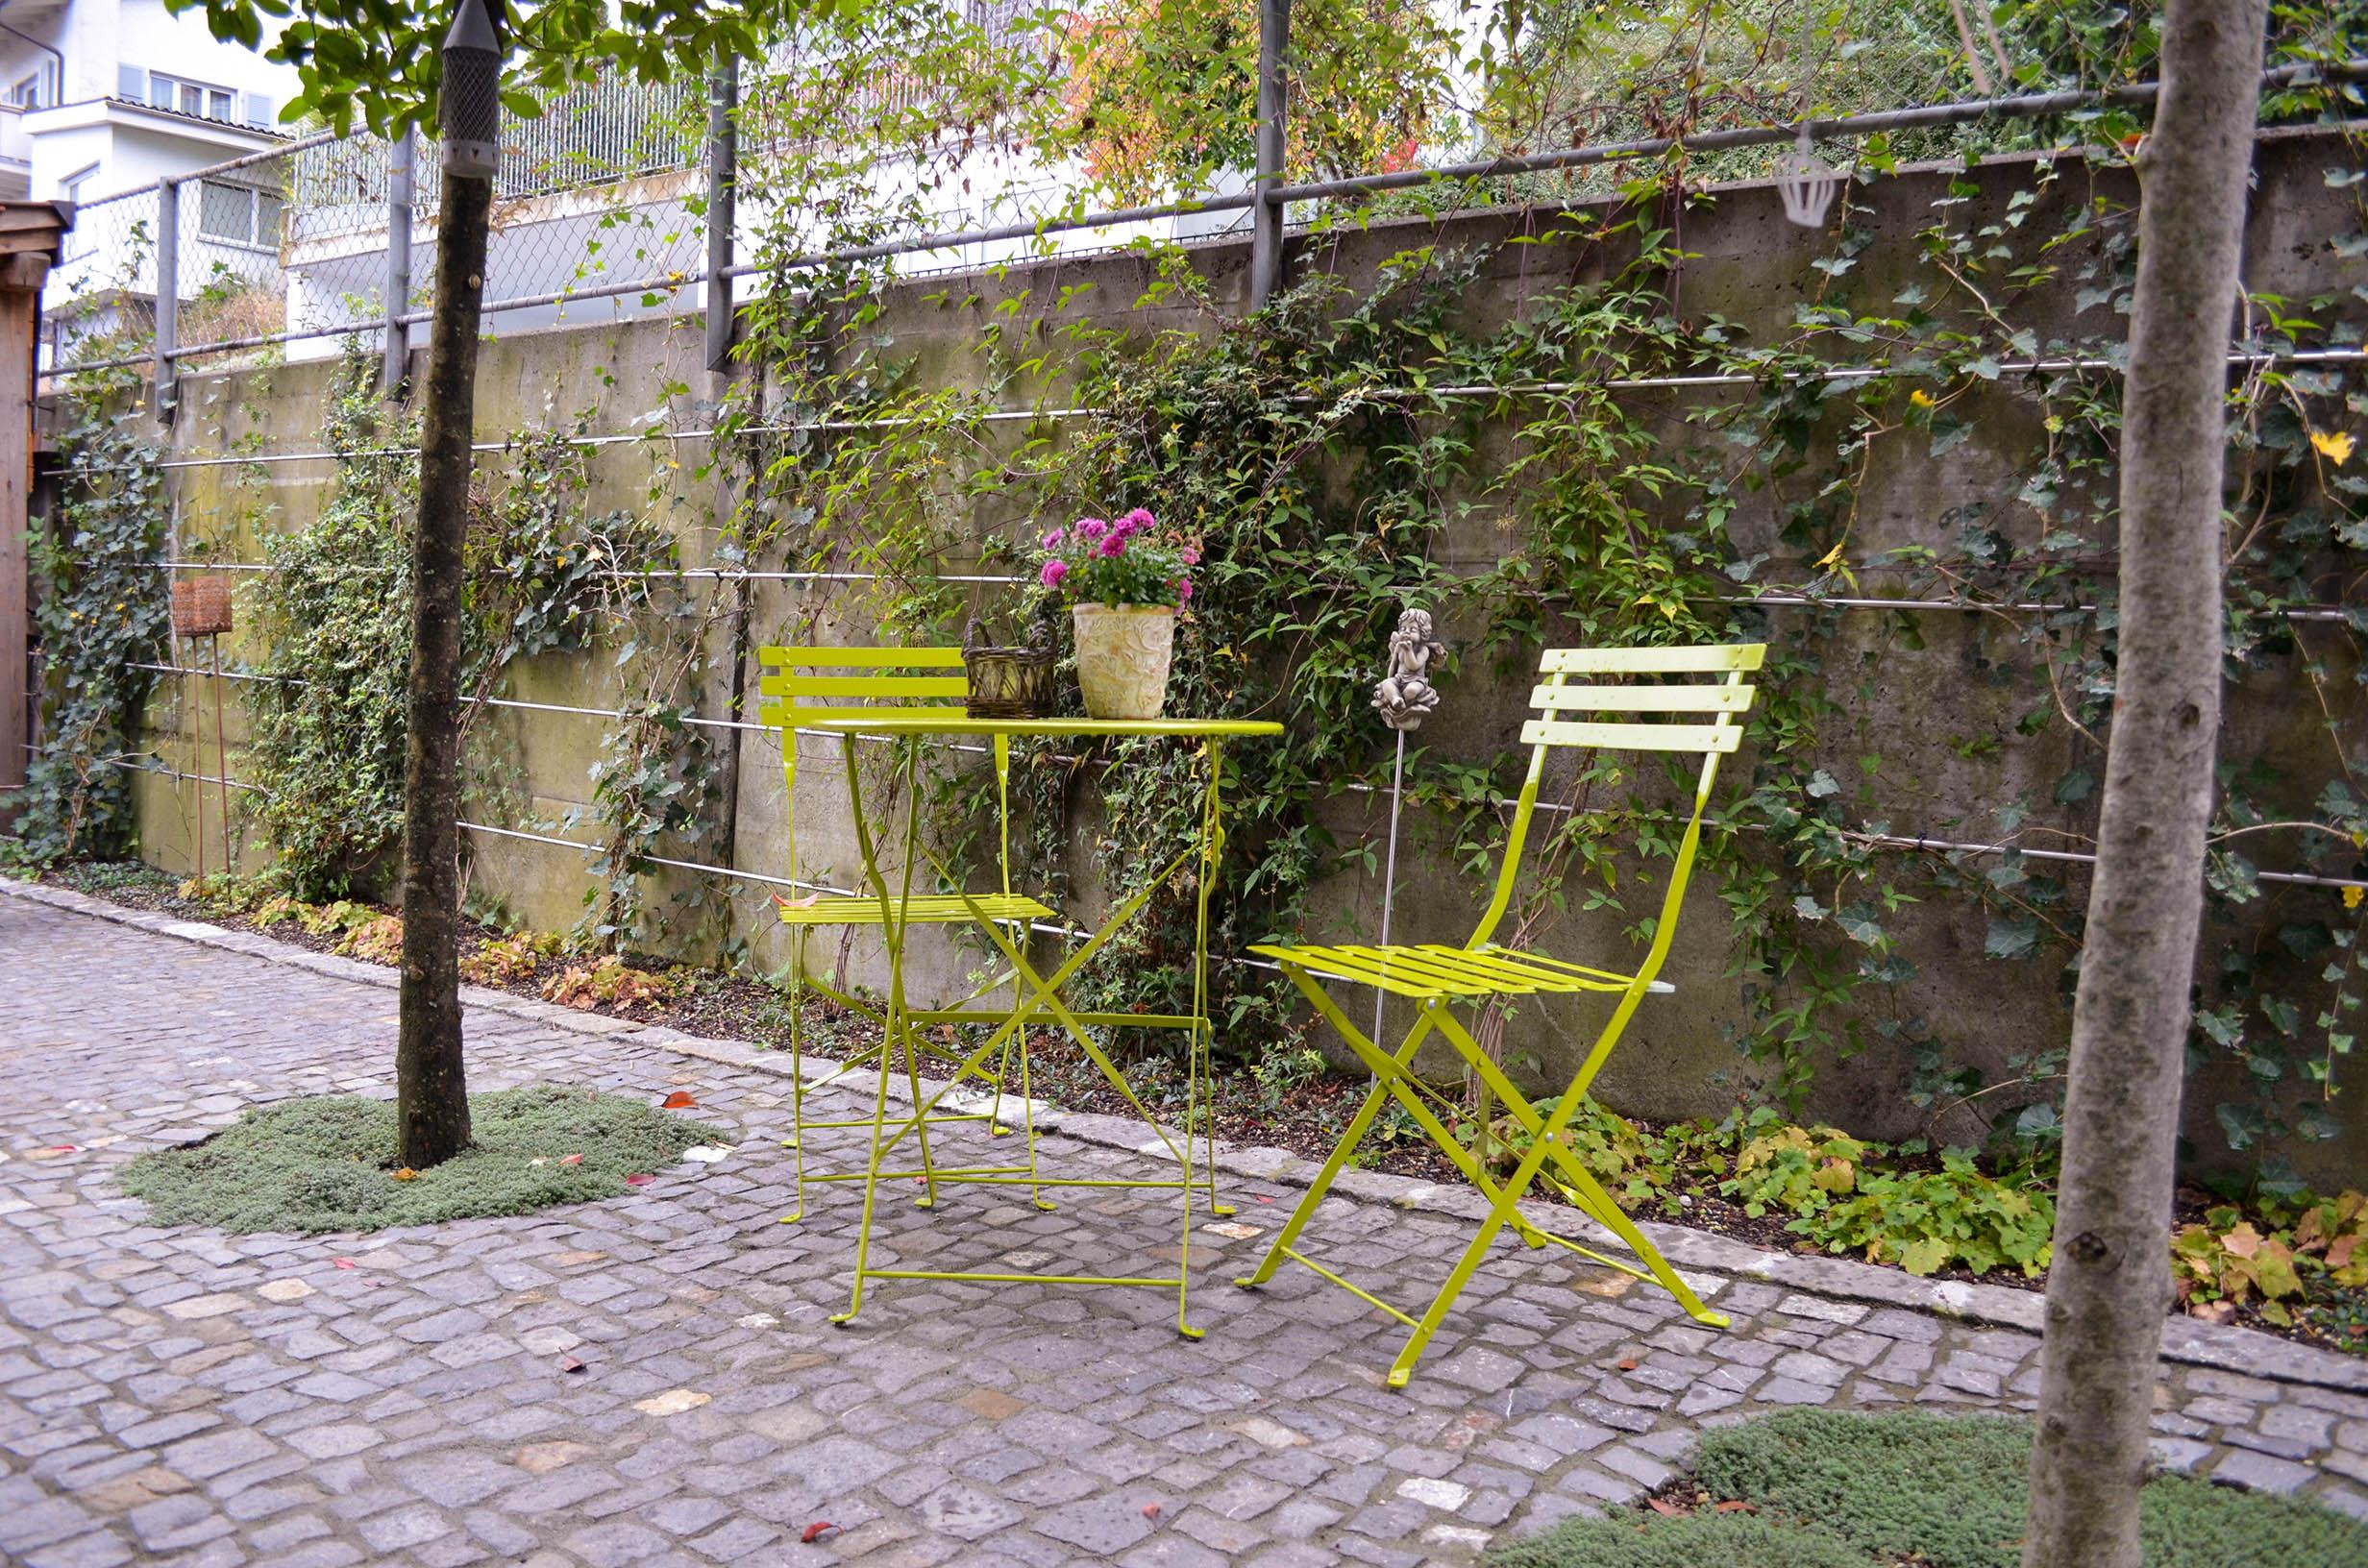 Gartenoase in Buochs 10